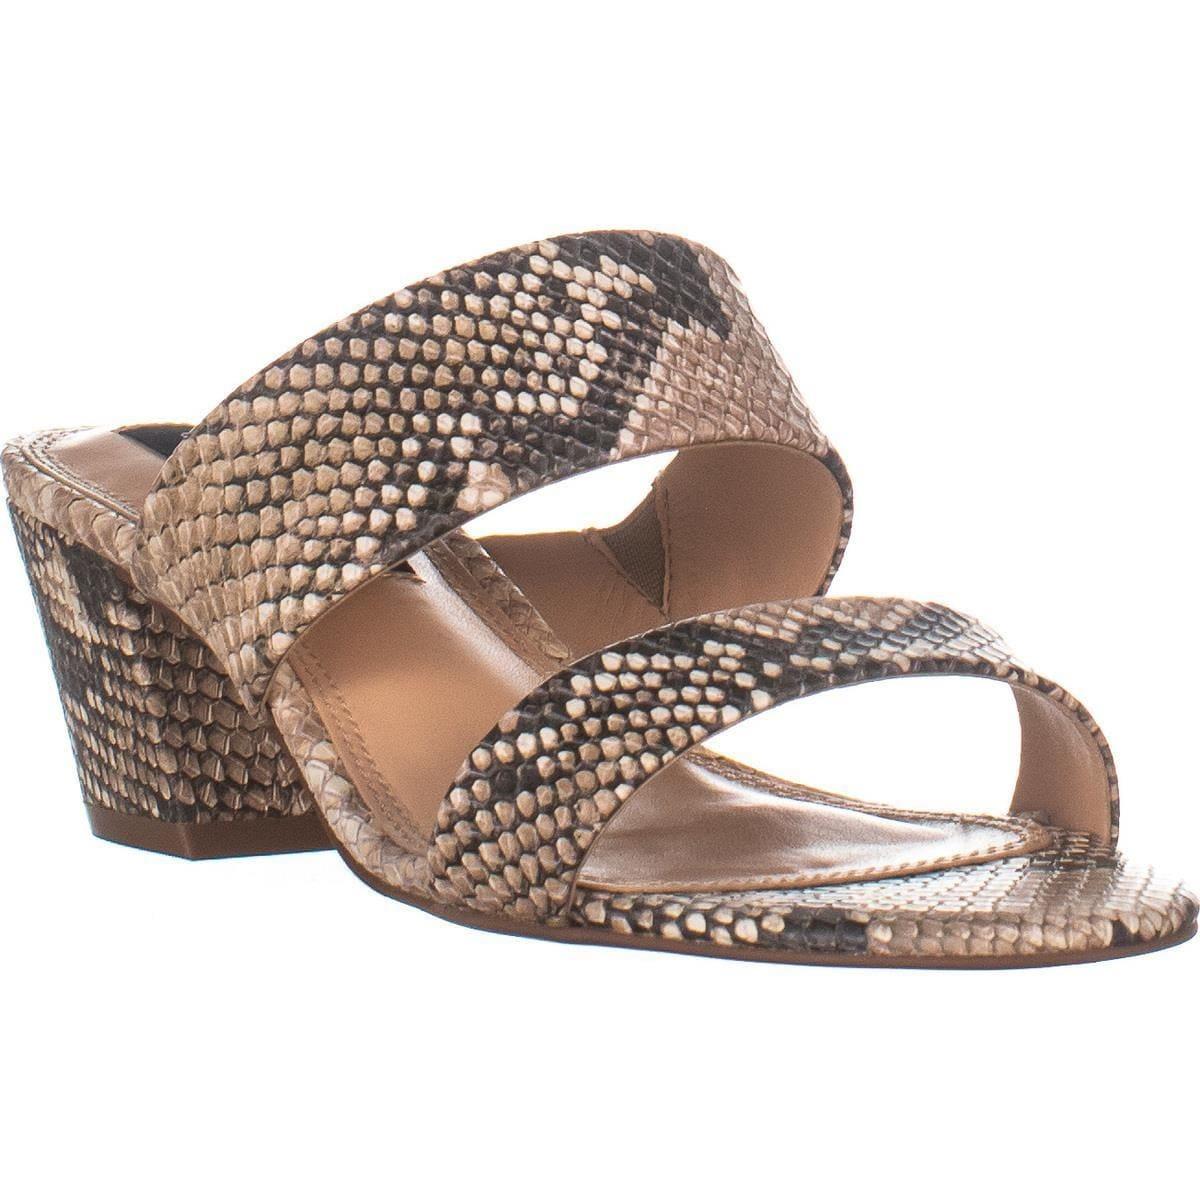 Details about  /STEVEN by Steve Madden Women/'s Viviene Heeled Sandal